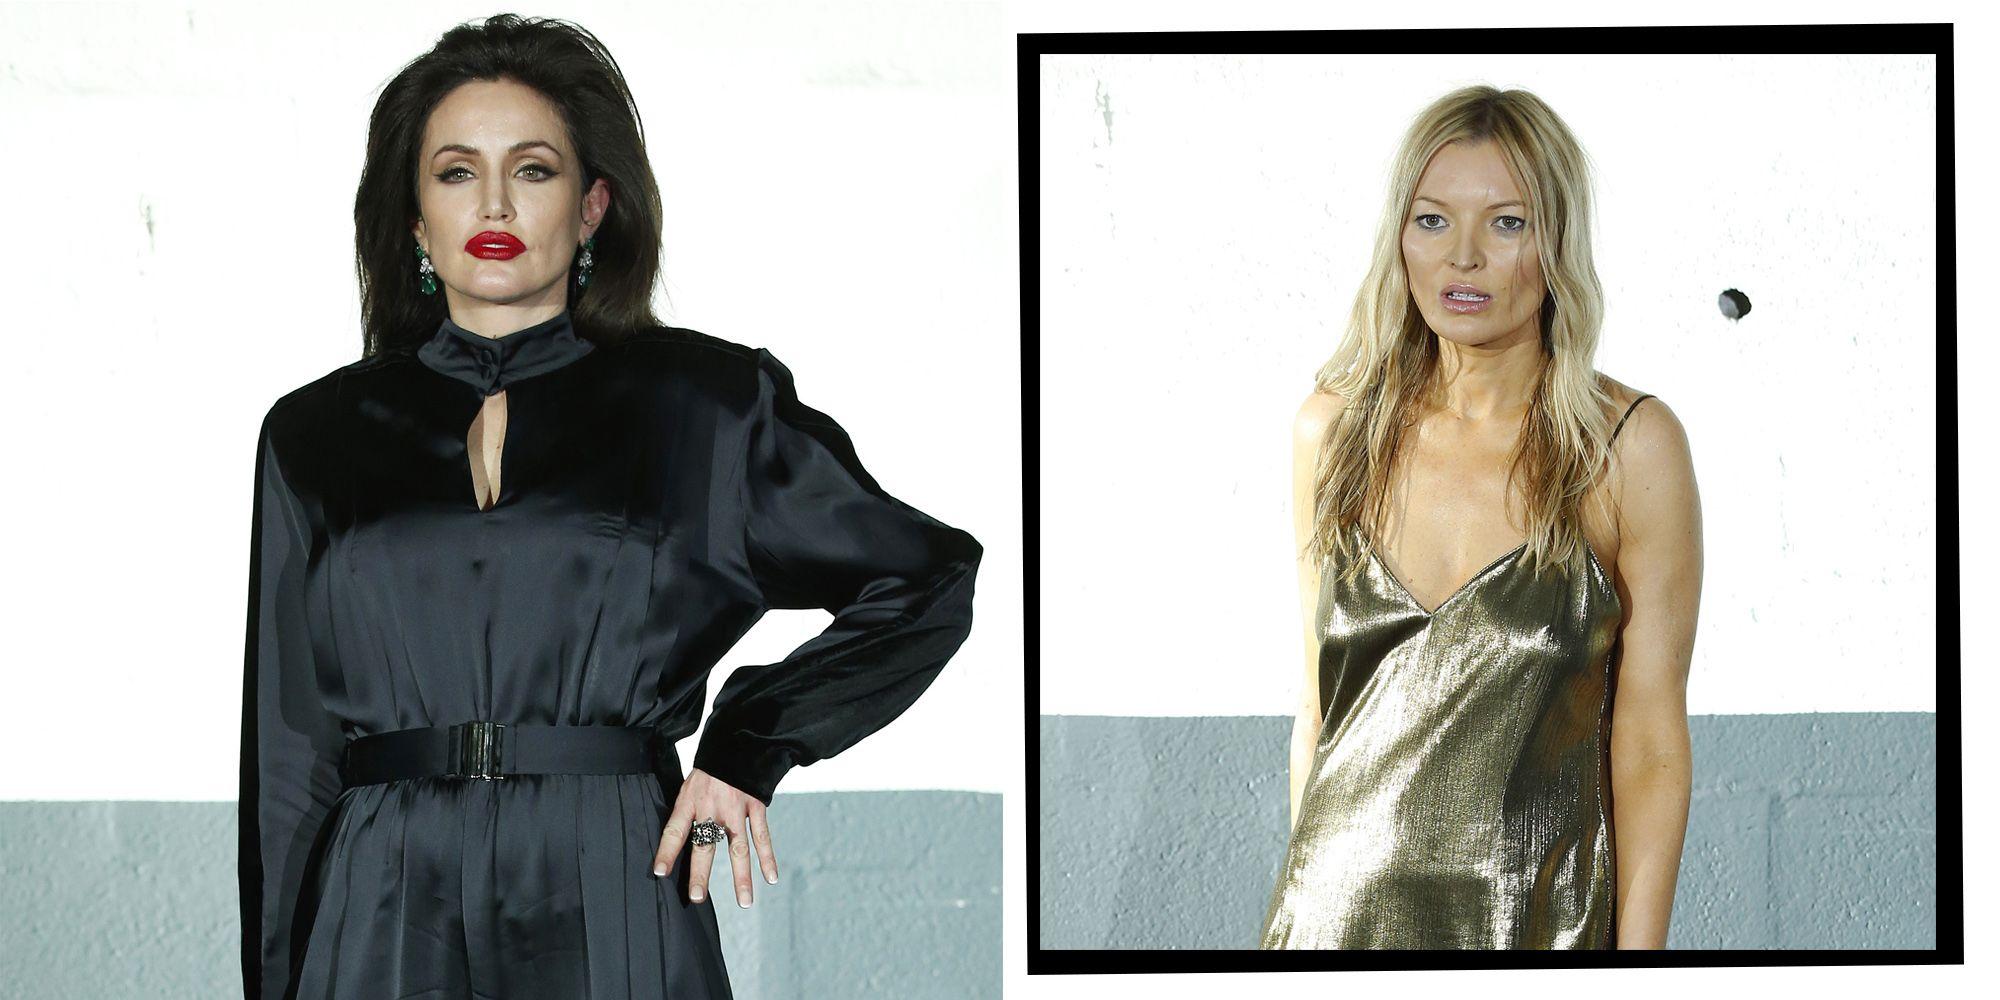 'Angelina Jolie', 'Kate Moss' And 'Naomi Campbell' Walk Vetements Show At Men's Paris Fashion Week